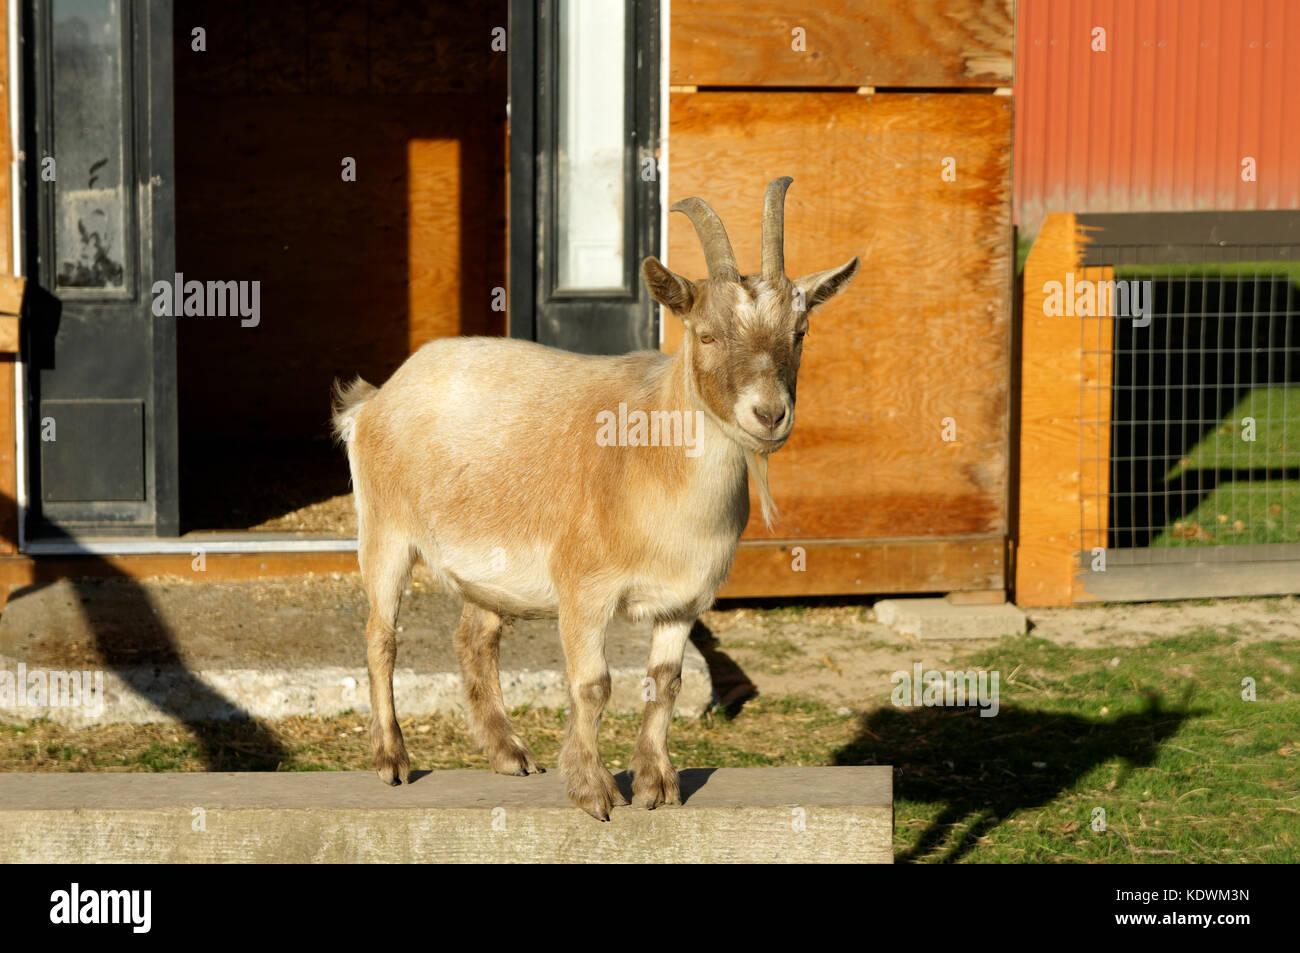 Mature adult miniature goat at Westham Island Herb Farm, Delta, British Columbia, Canada - Stock Image